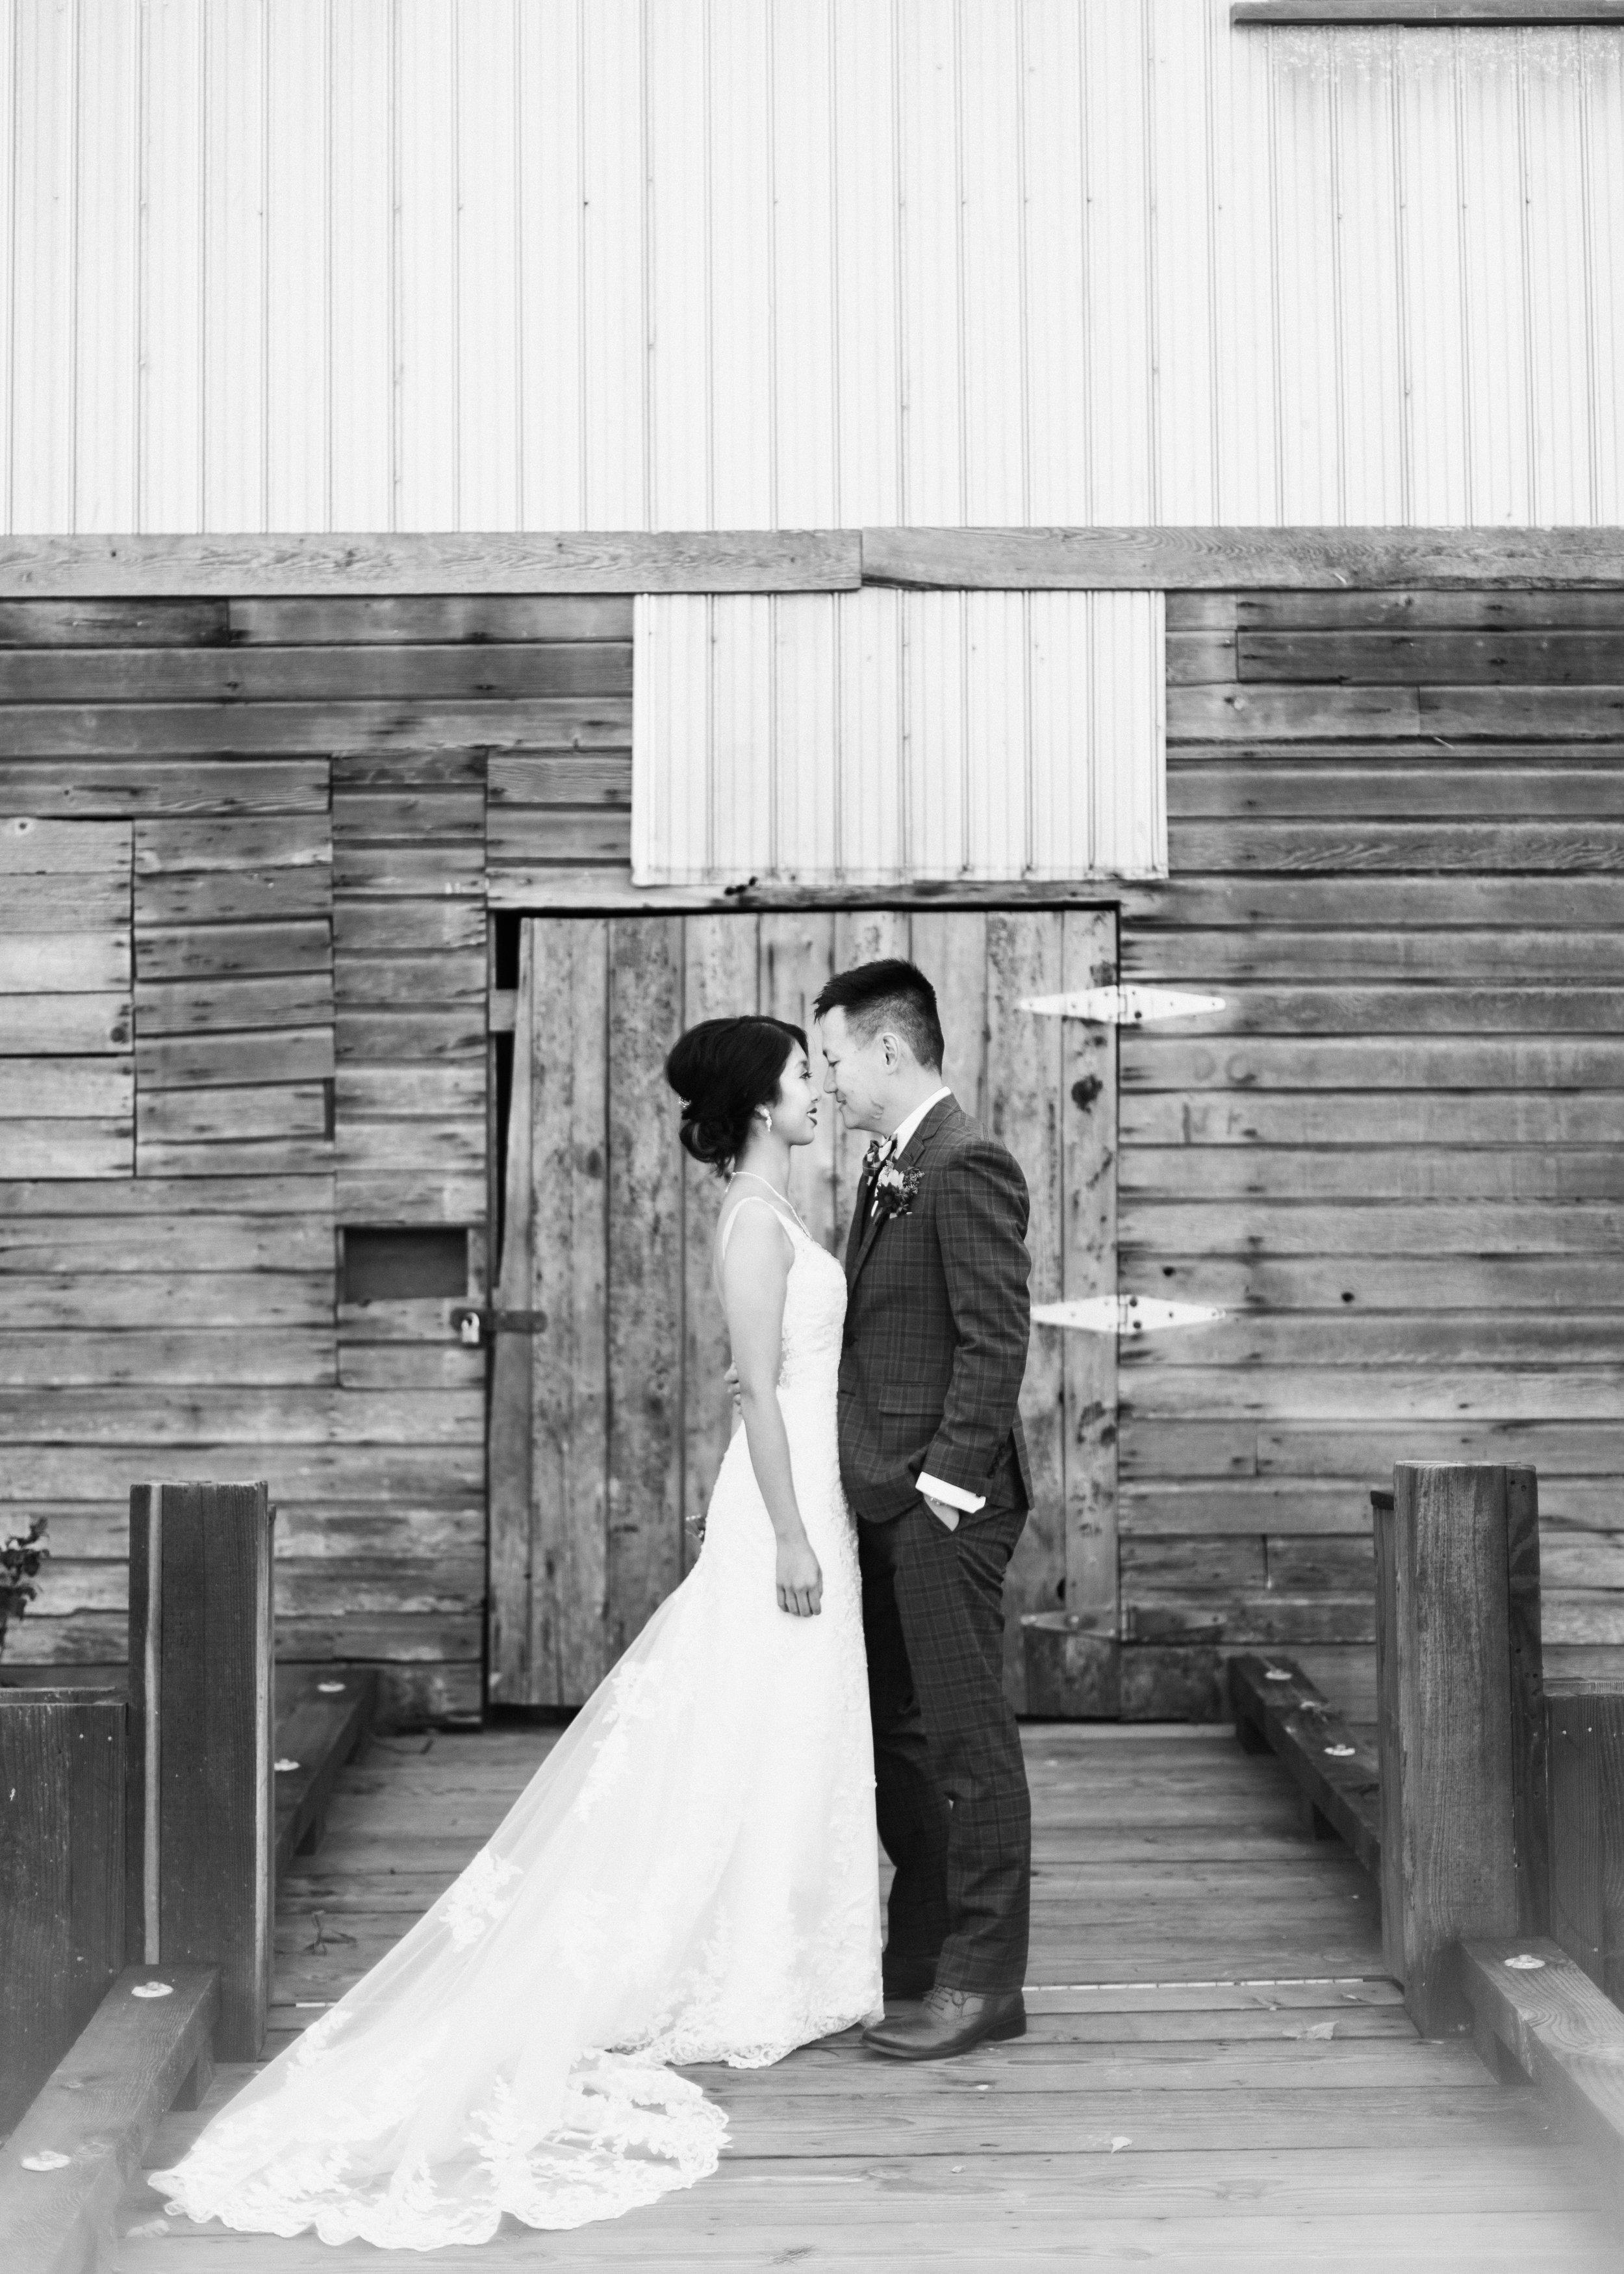 HeraStudios_Selects_VivianSam_Wedding_0277.jpg